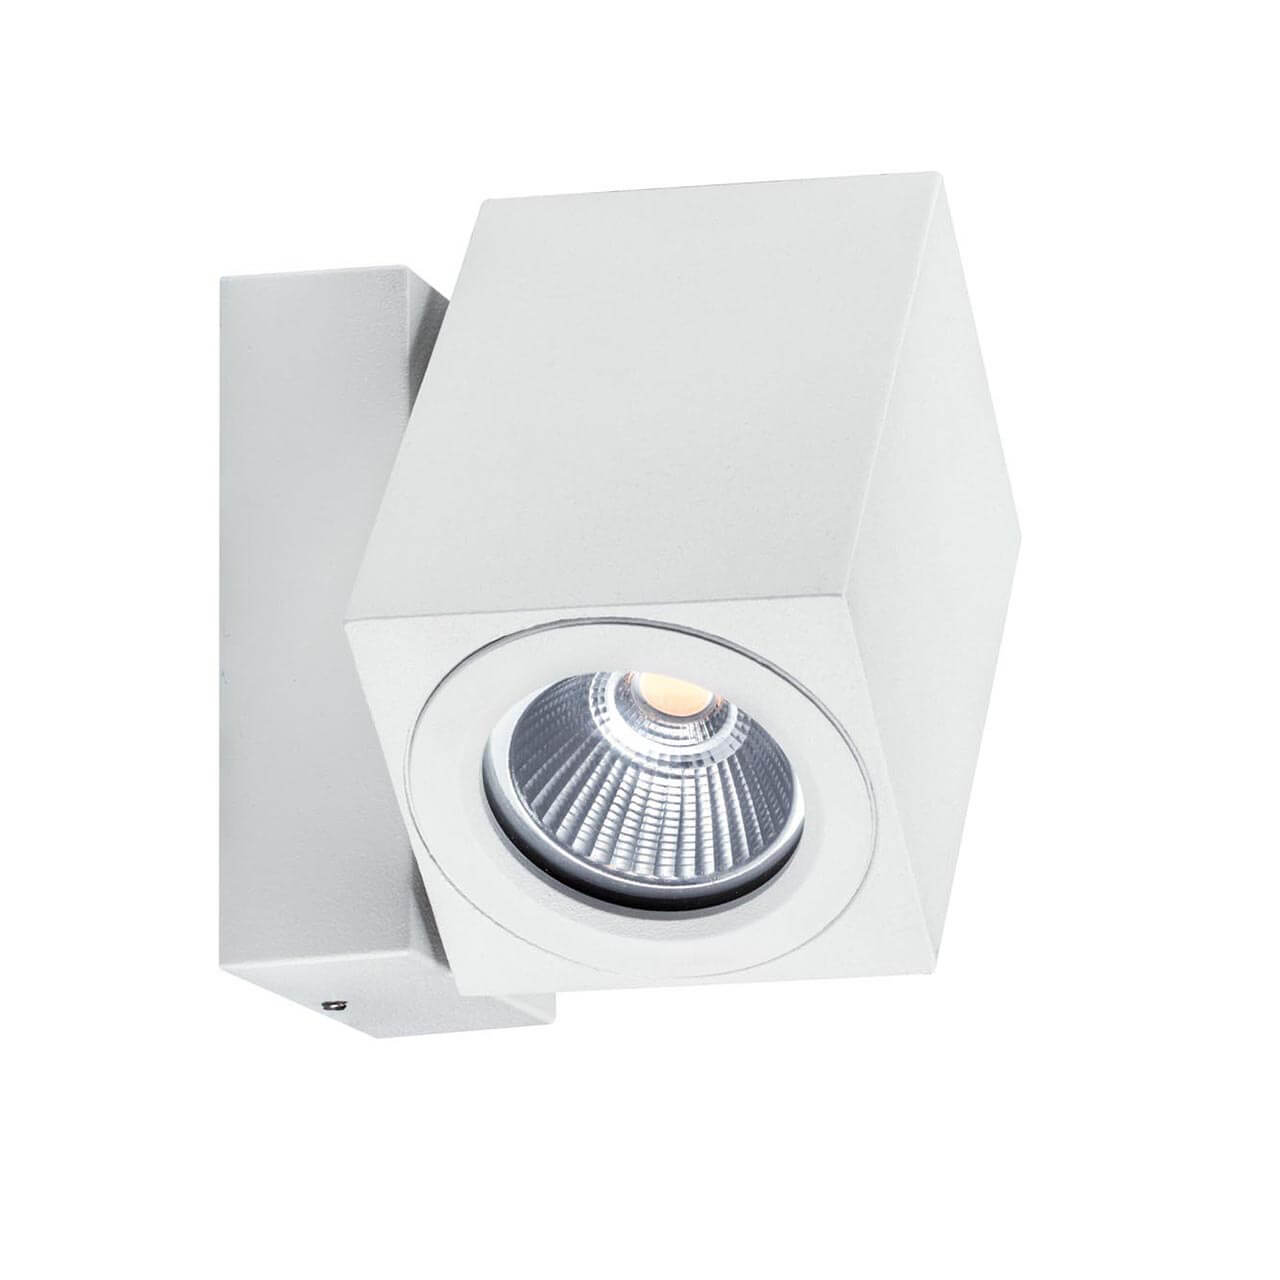 Светильник Paulmann 93782 Cube